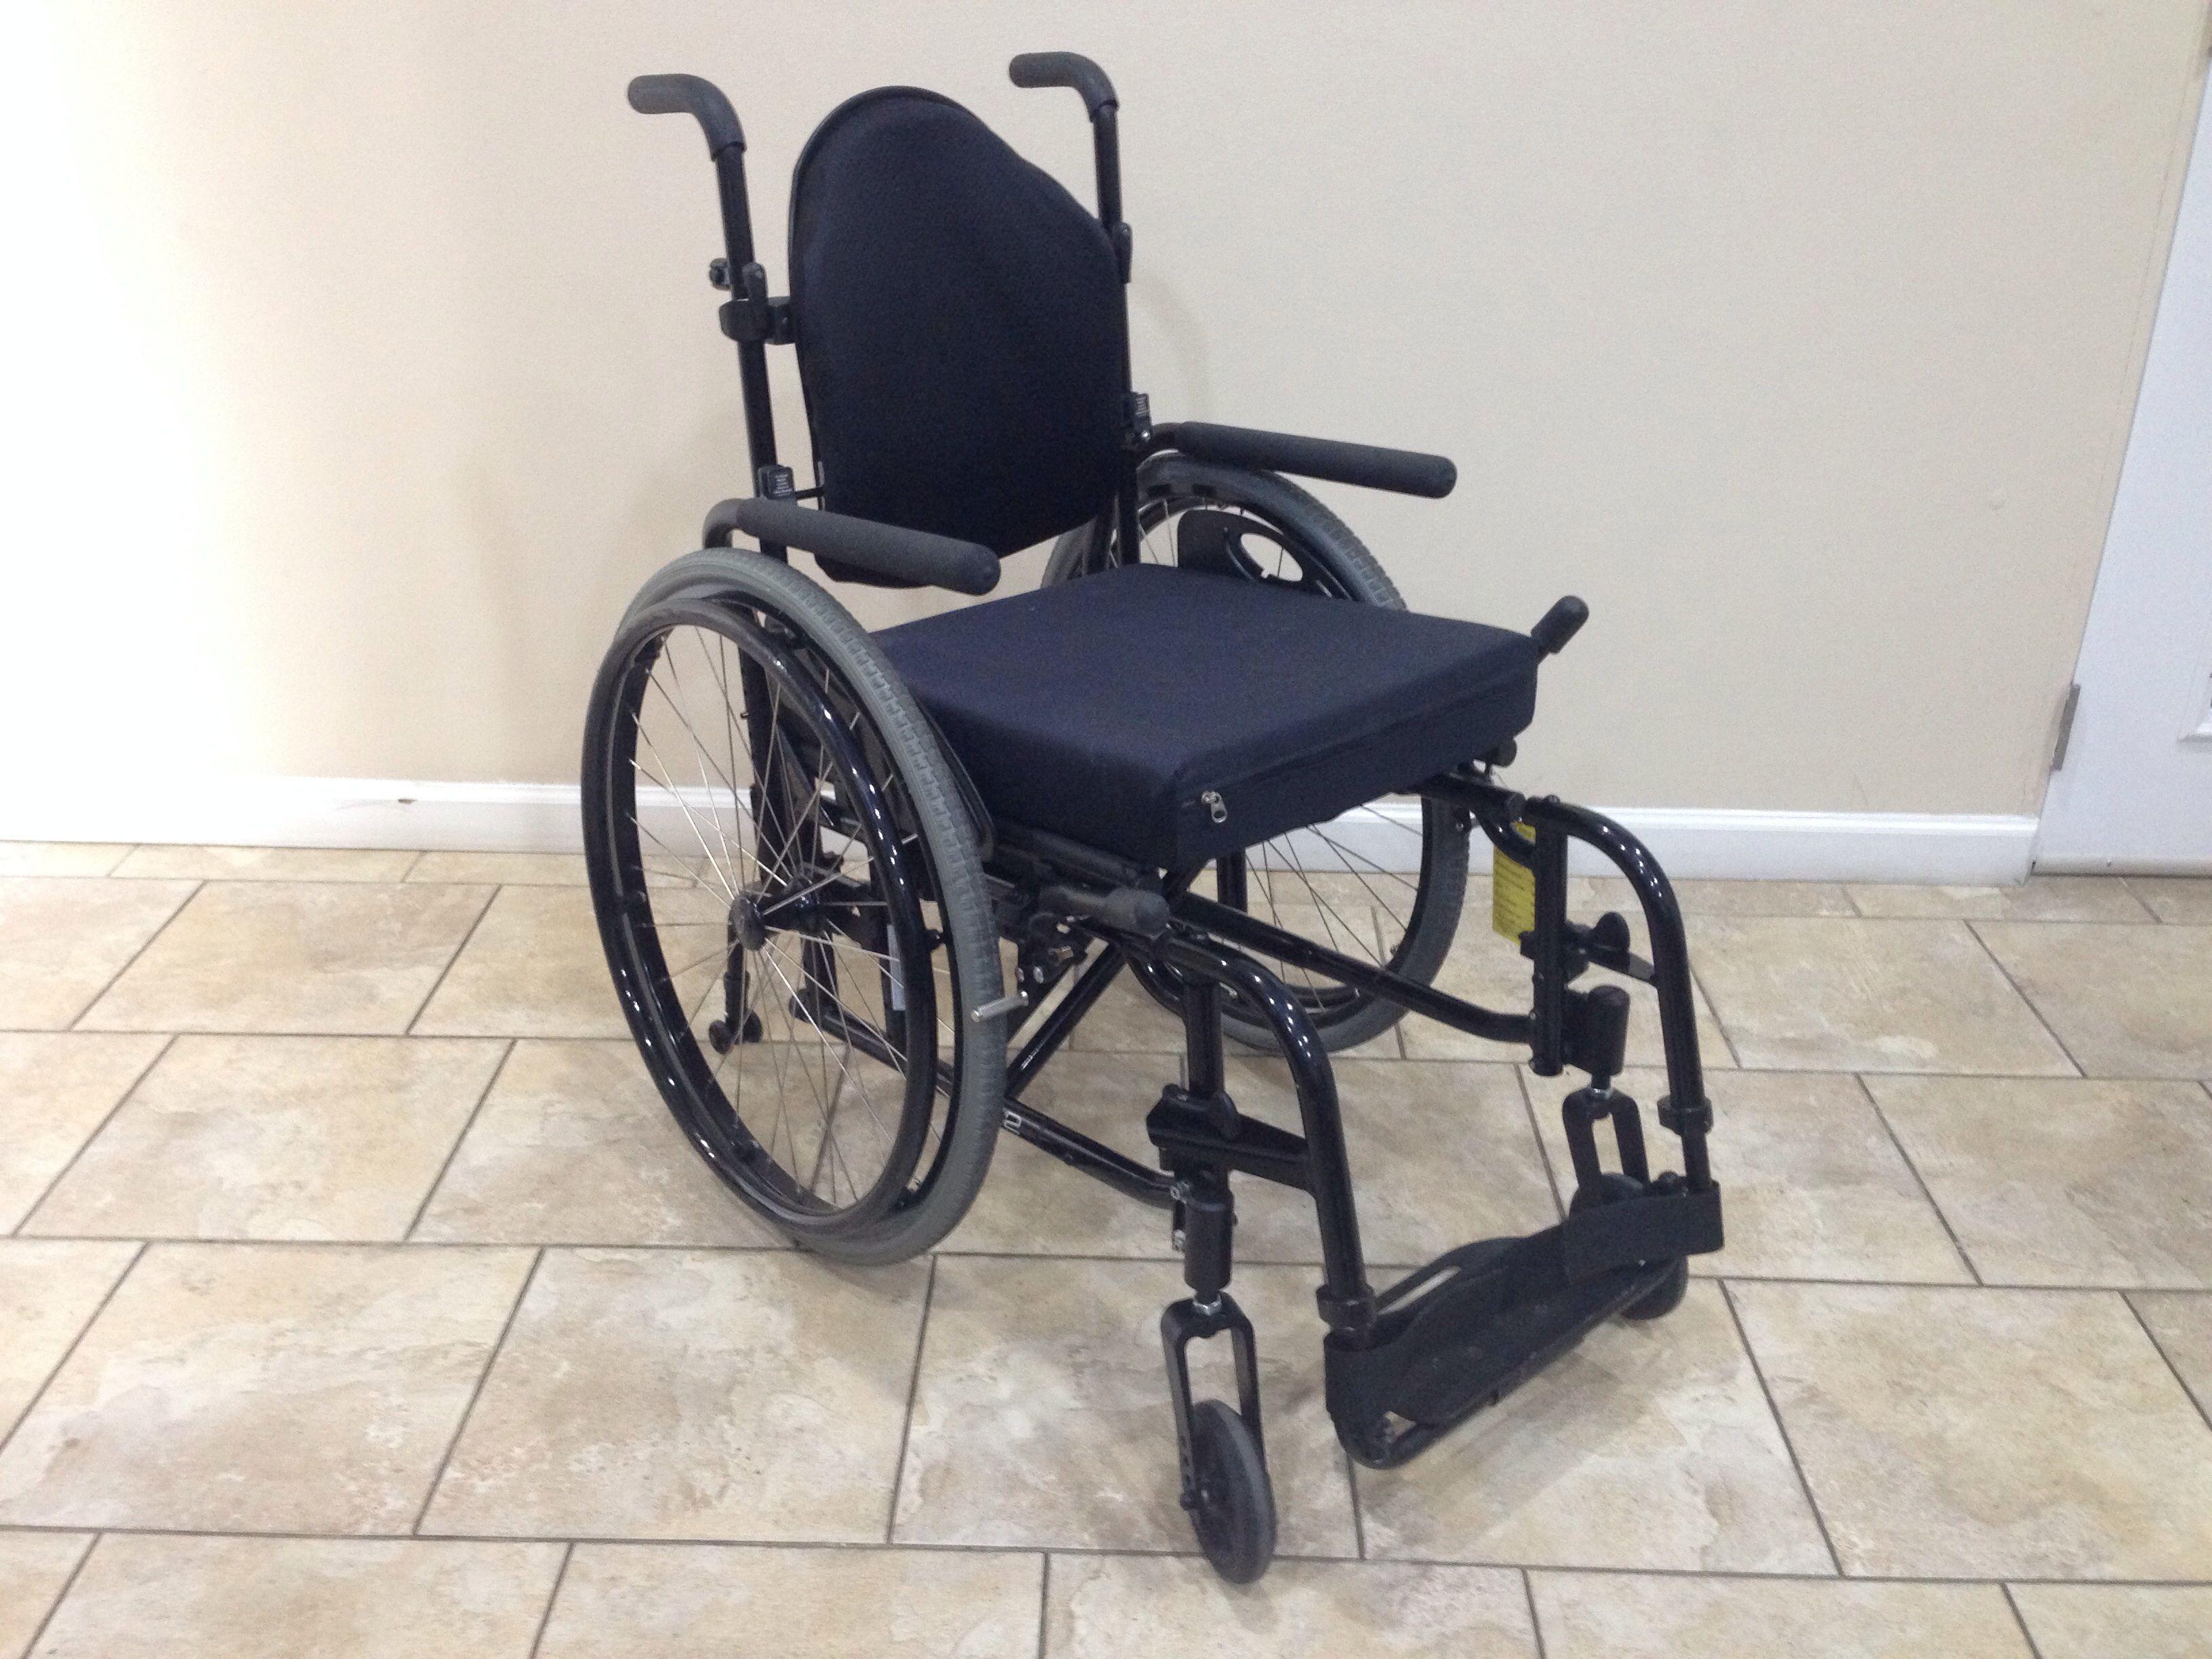 Sunrise Medical EIQ2N Quickie 2 Folding Manual Wheelchair (Black) http://www.openboxmedical.com/shop/manual-wheelchairs/sunrise-medical-quickie-2-folding-manual-wheelchair/